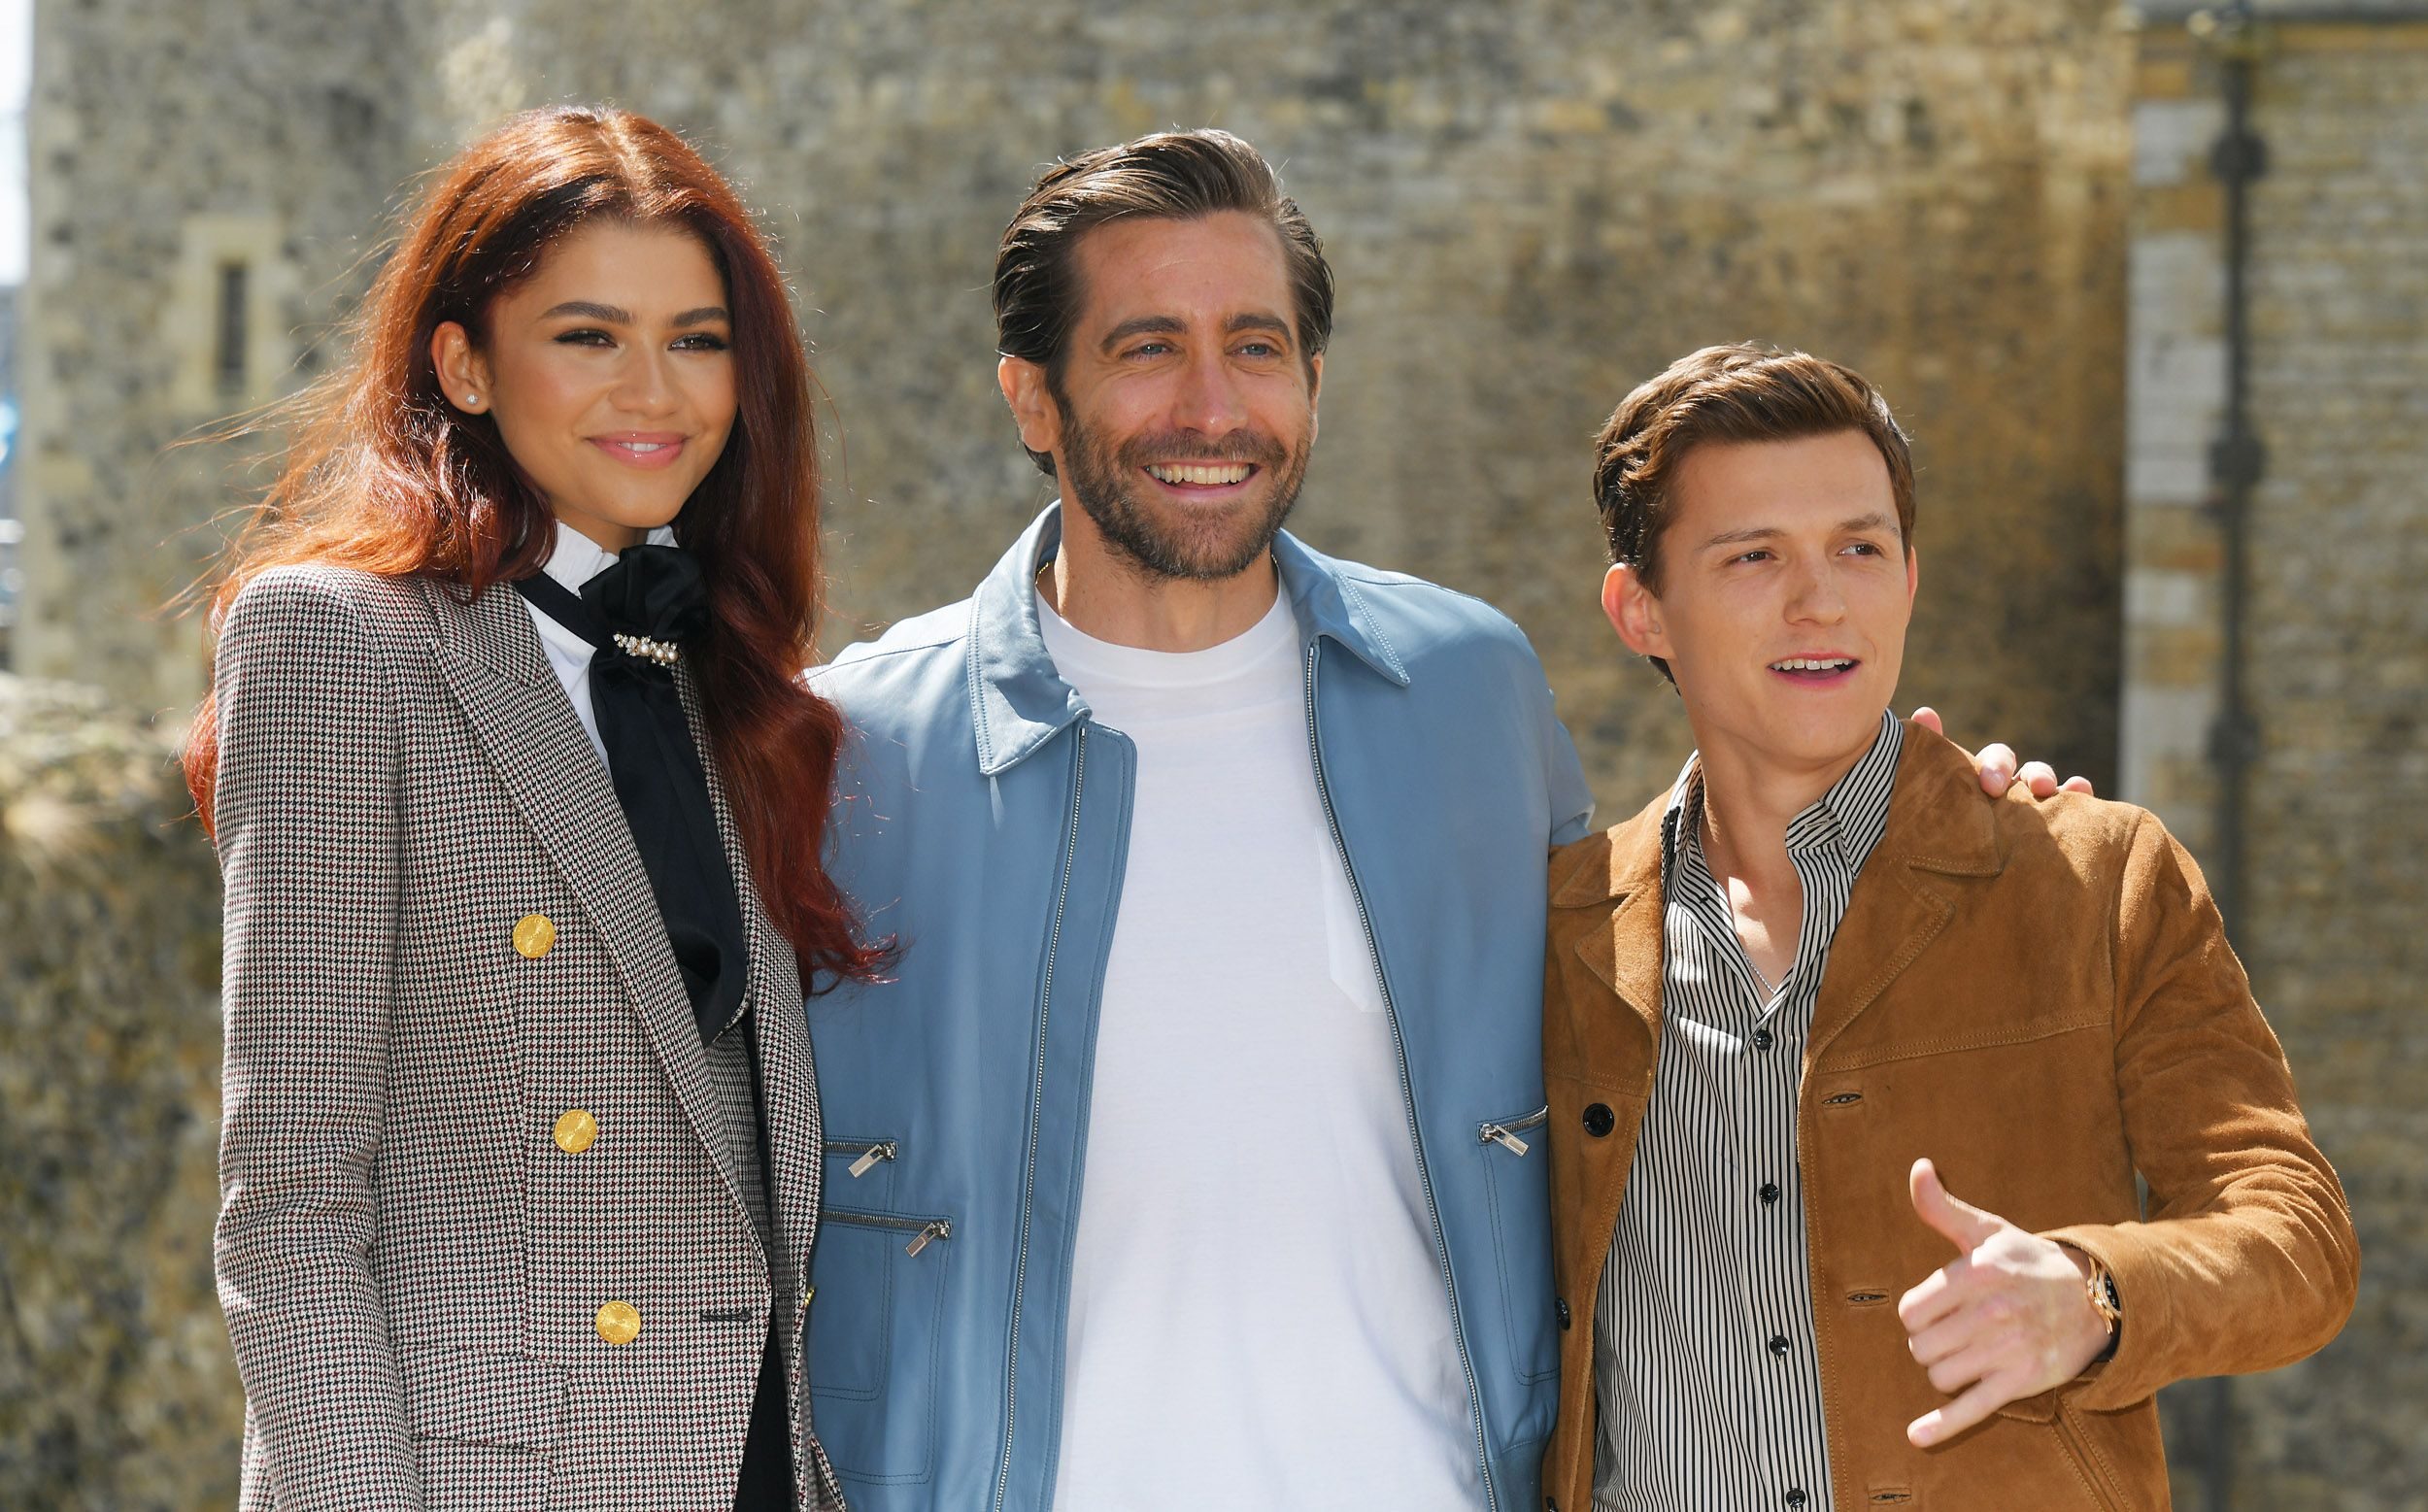 Jake Gyllenhaal And Tom Holland Just Rewrote The Summer Jacket Rule Book